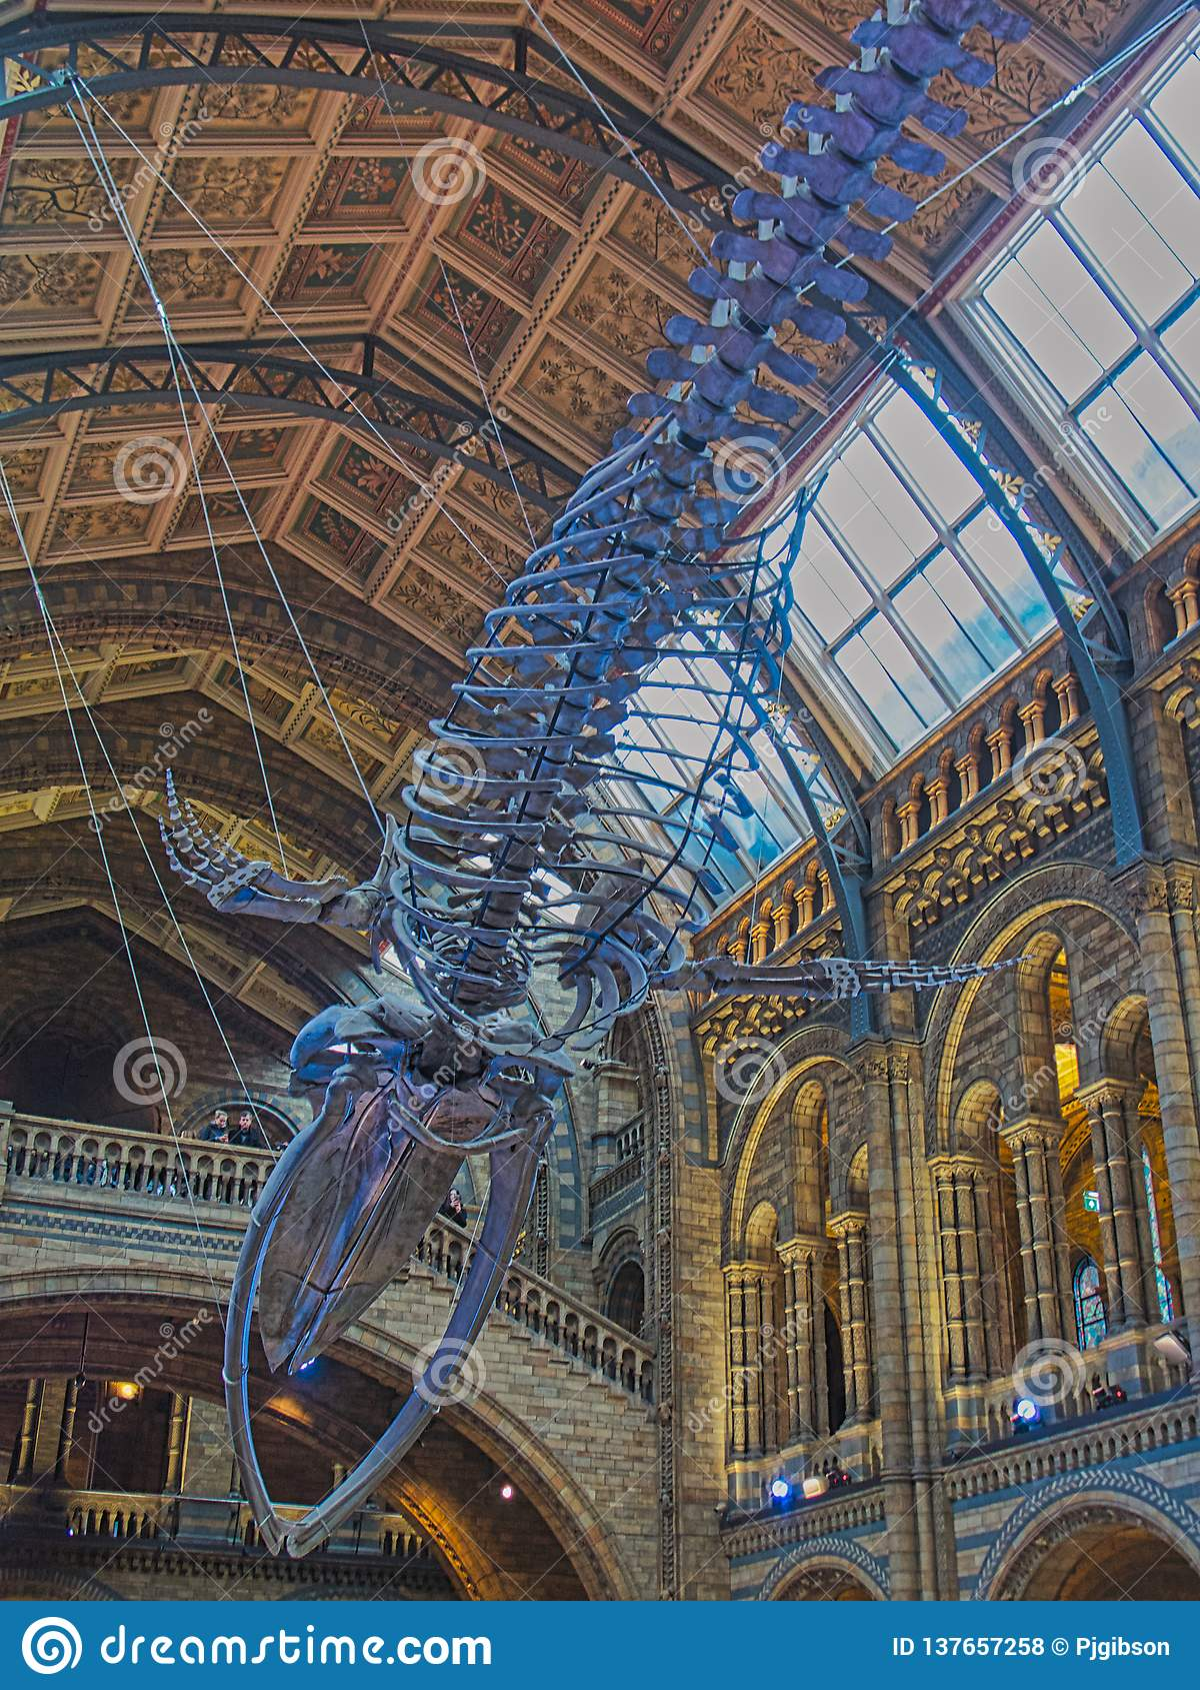 Hope -Blue whale skeleton